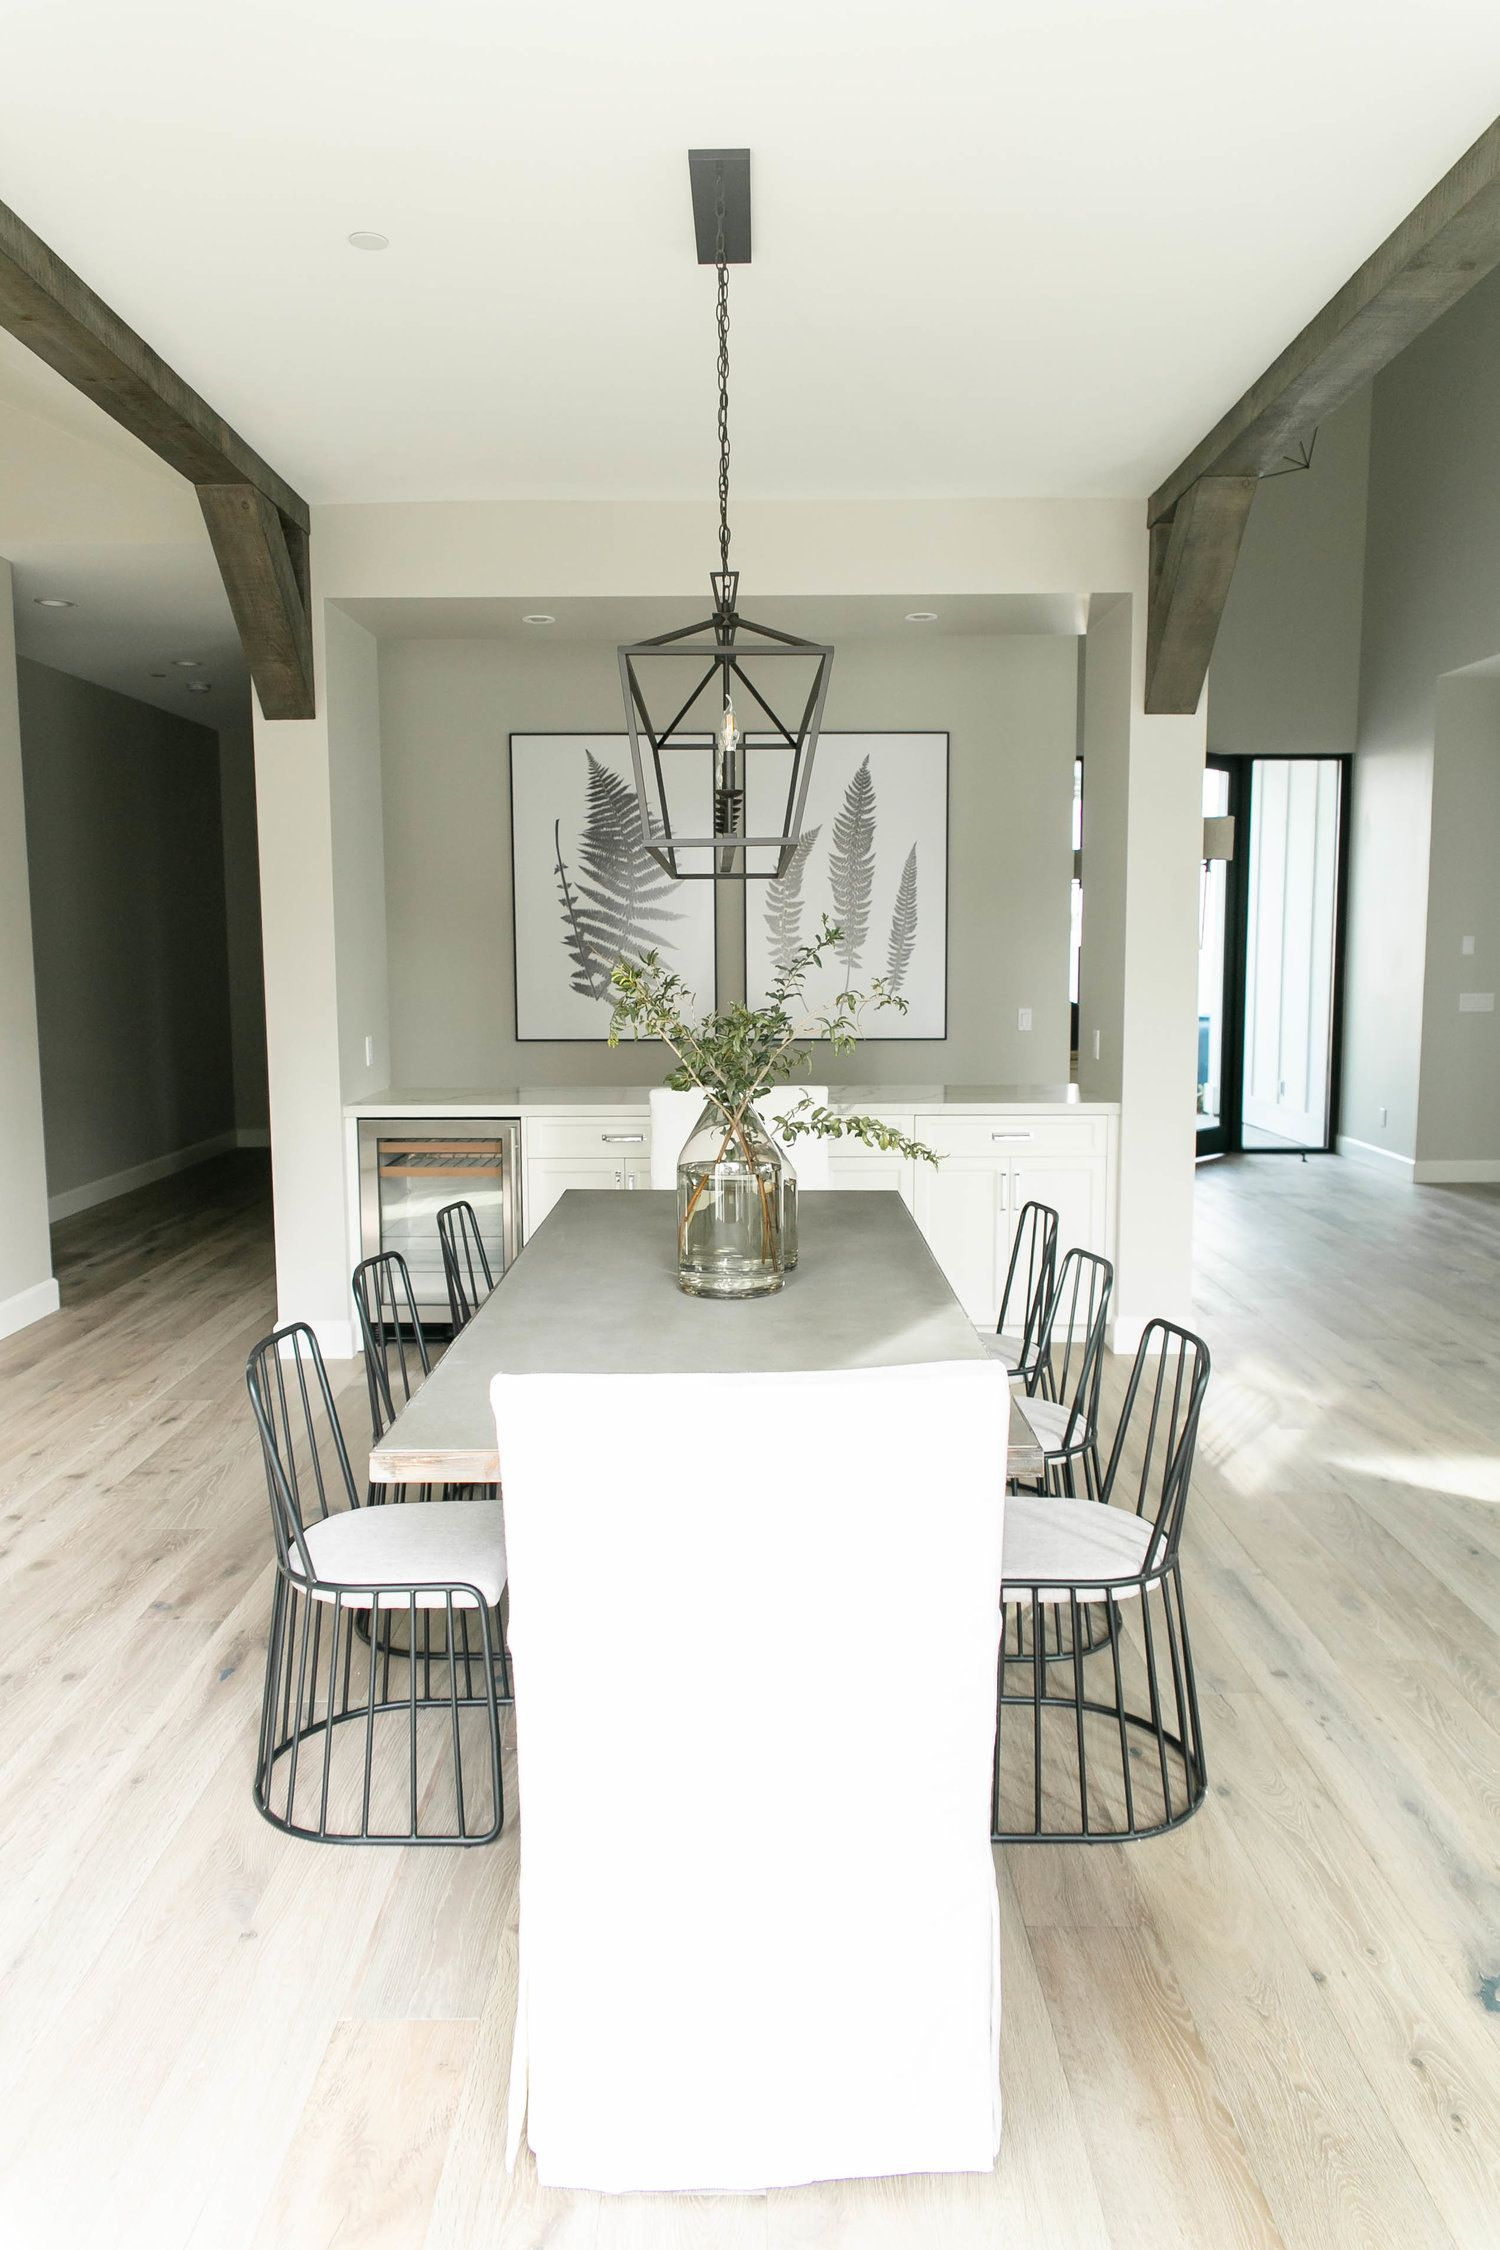 BrieBellaProject   Home decor kitchen, House design, Home